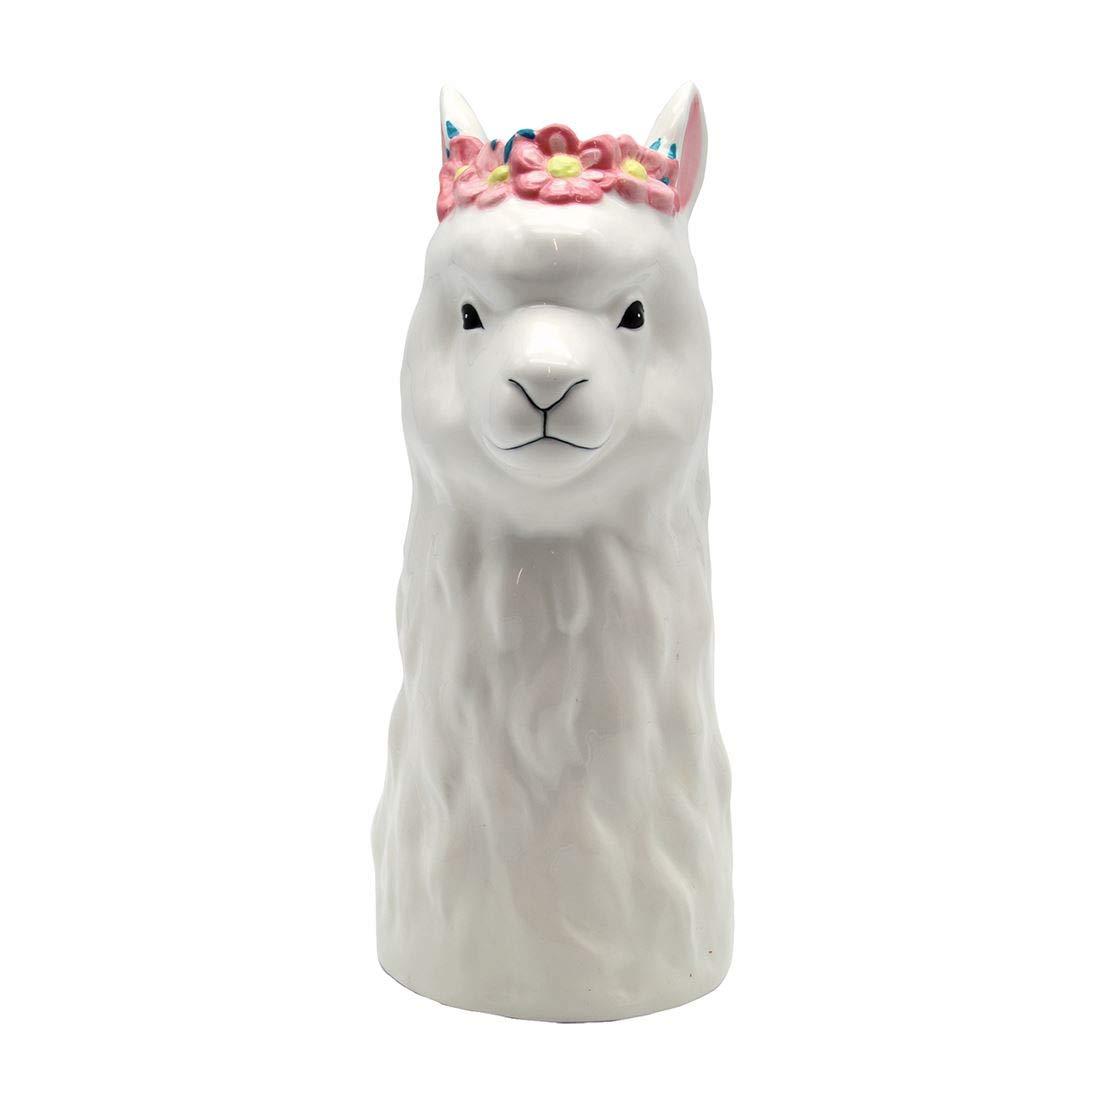 "DEI Llama Vase, 5"" x 10"", Multicolored"